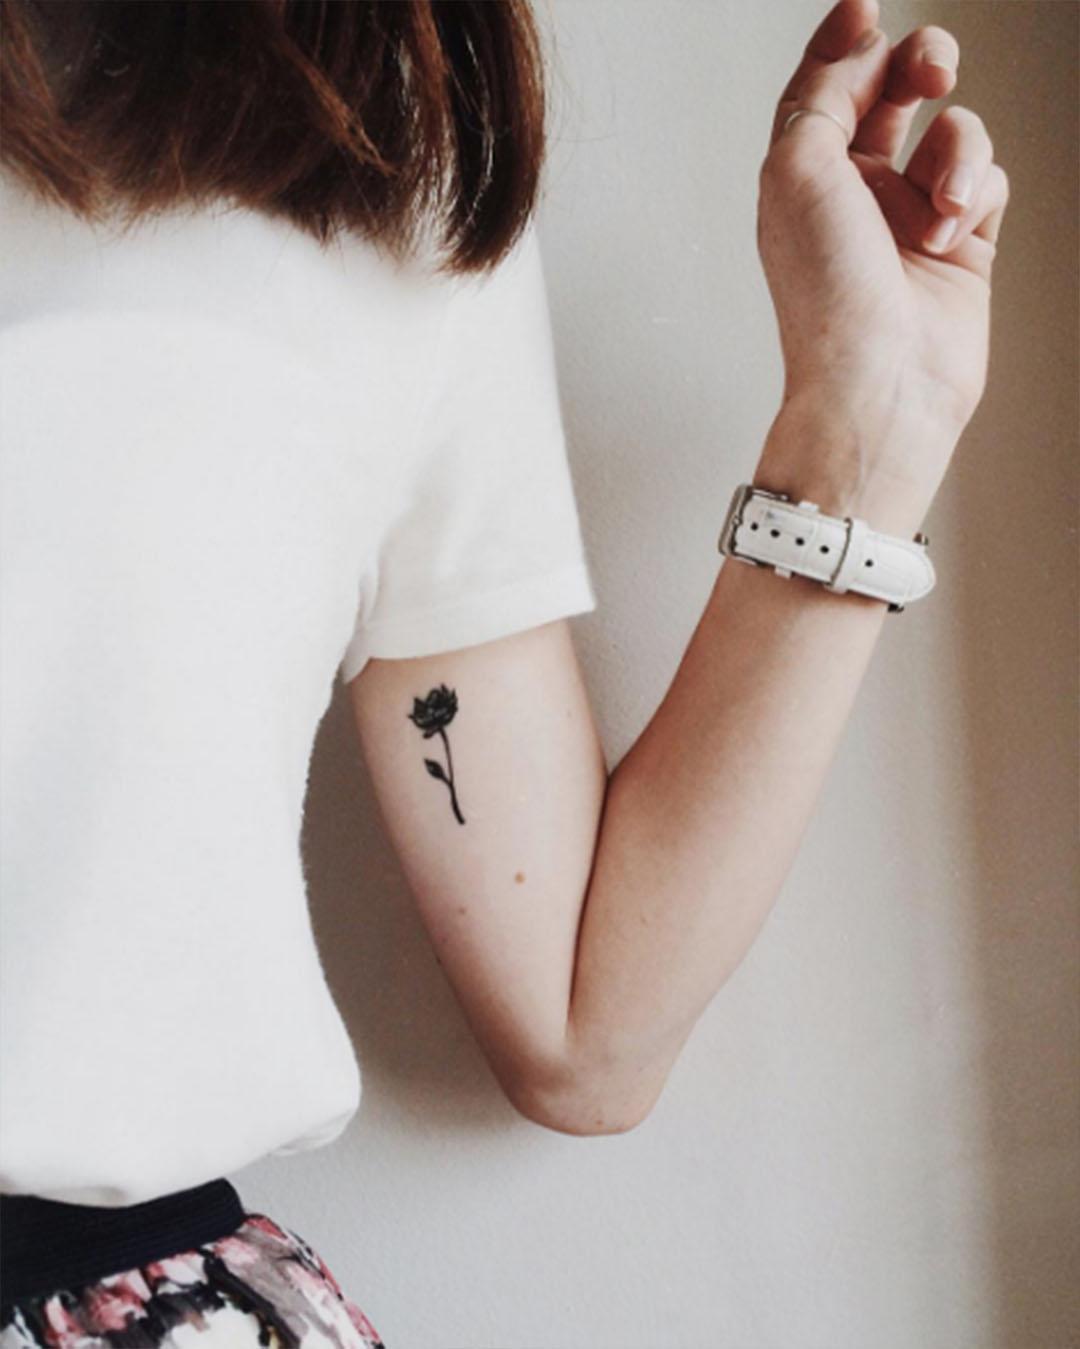 Tatuajes Minimalistas Femeninos Originales Tumblr Elsexoso